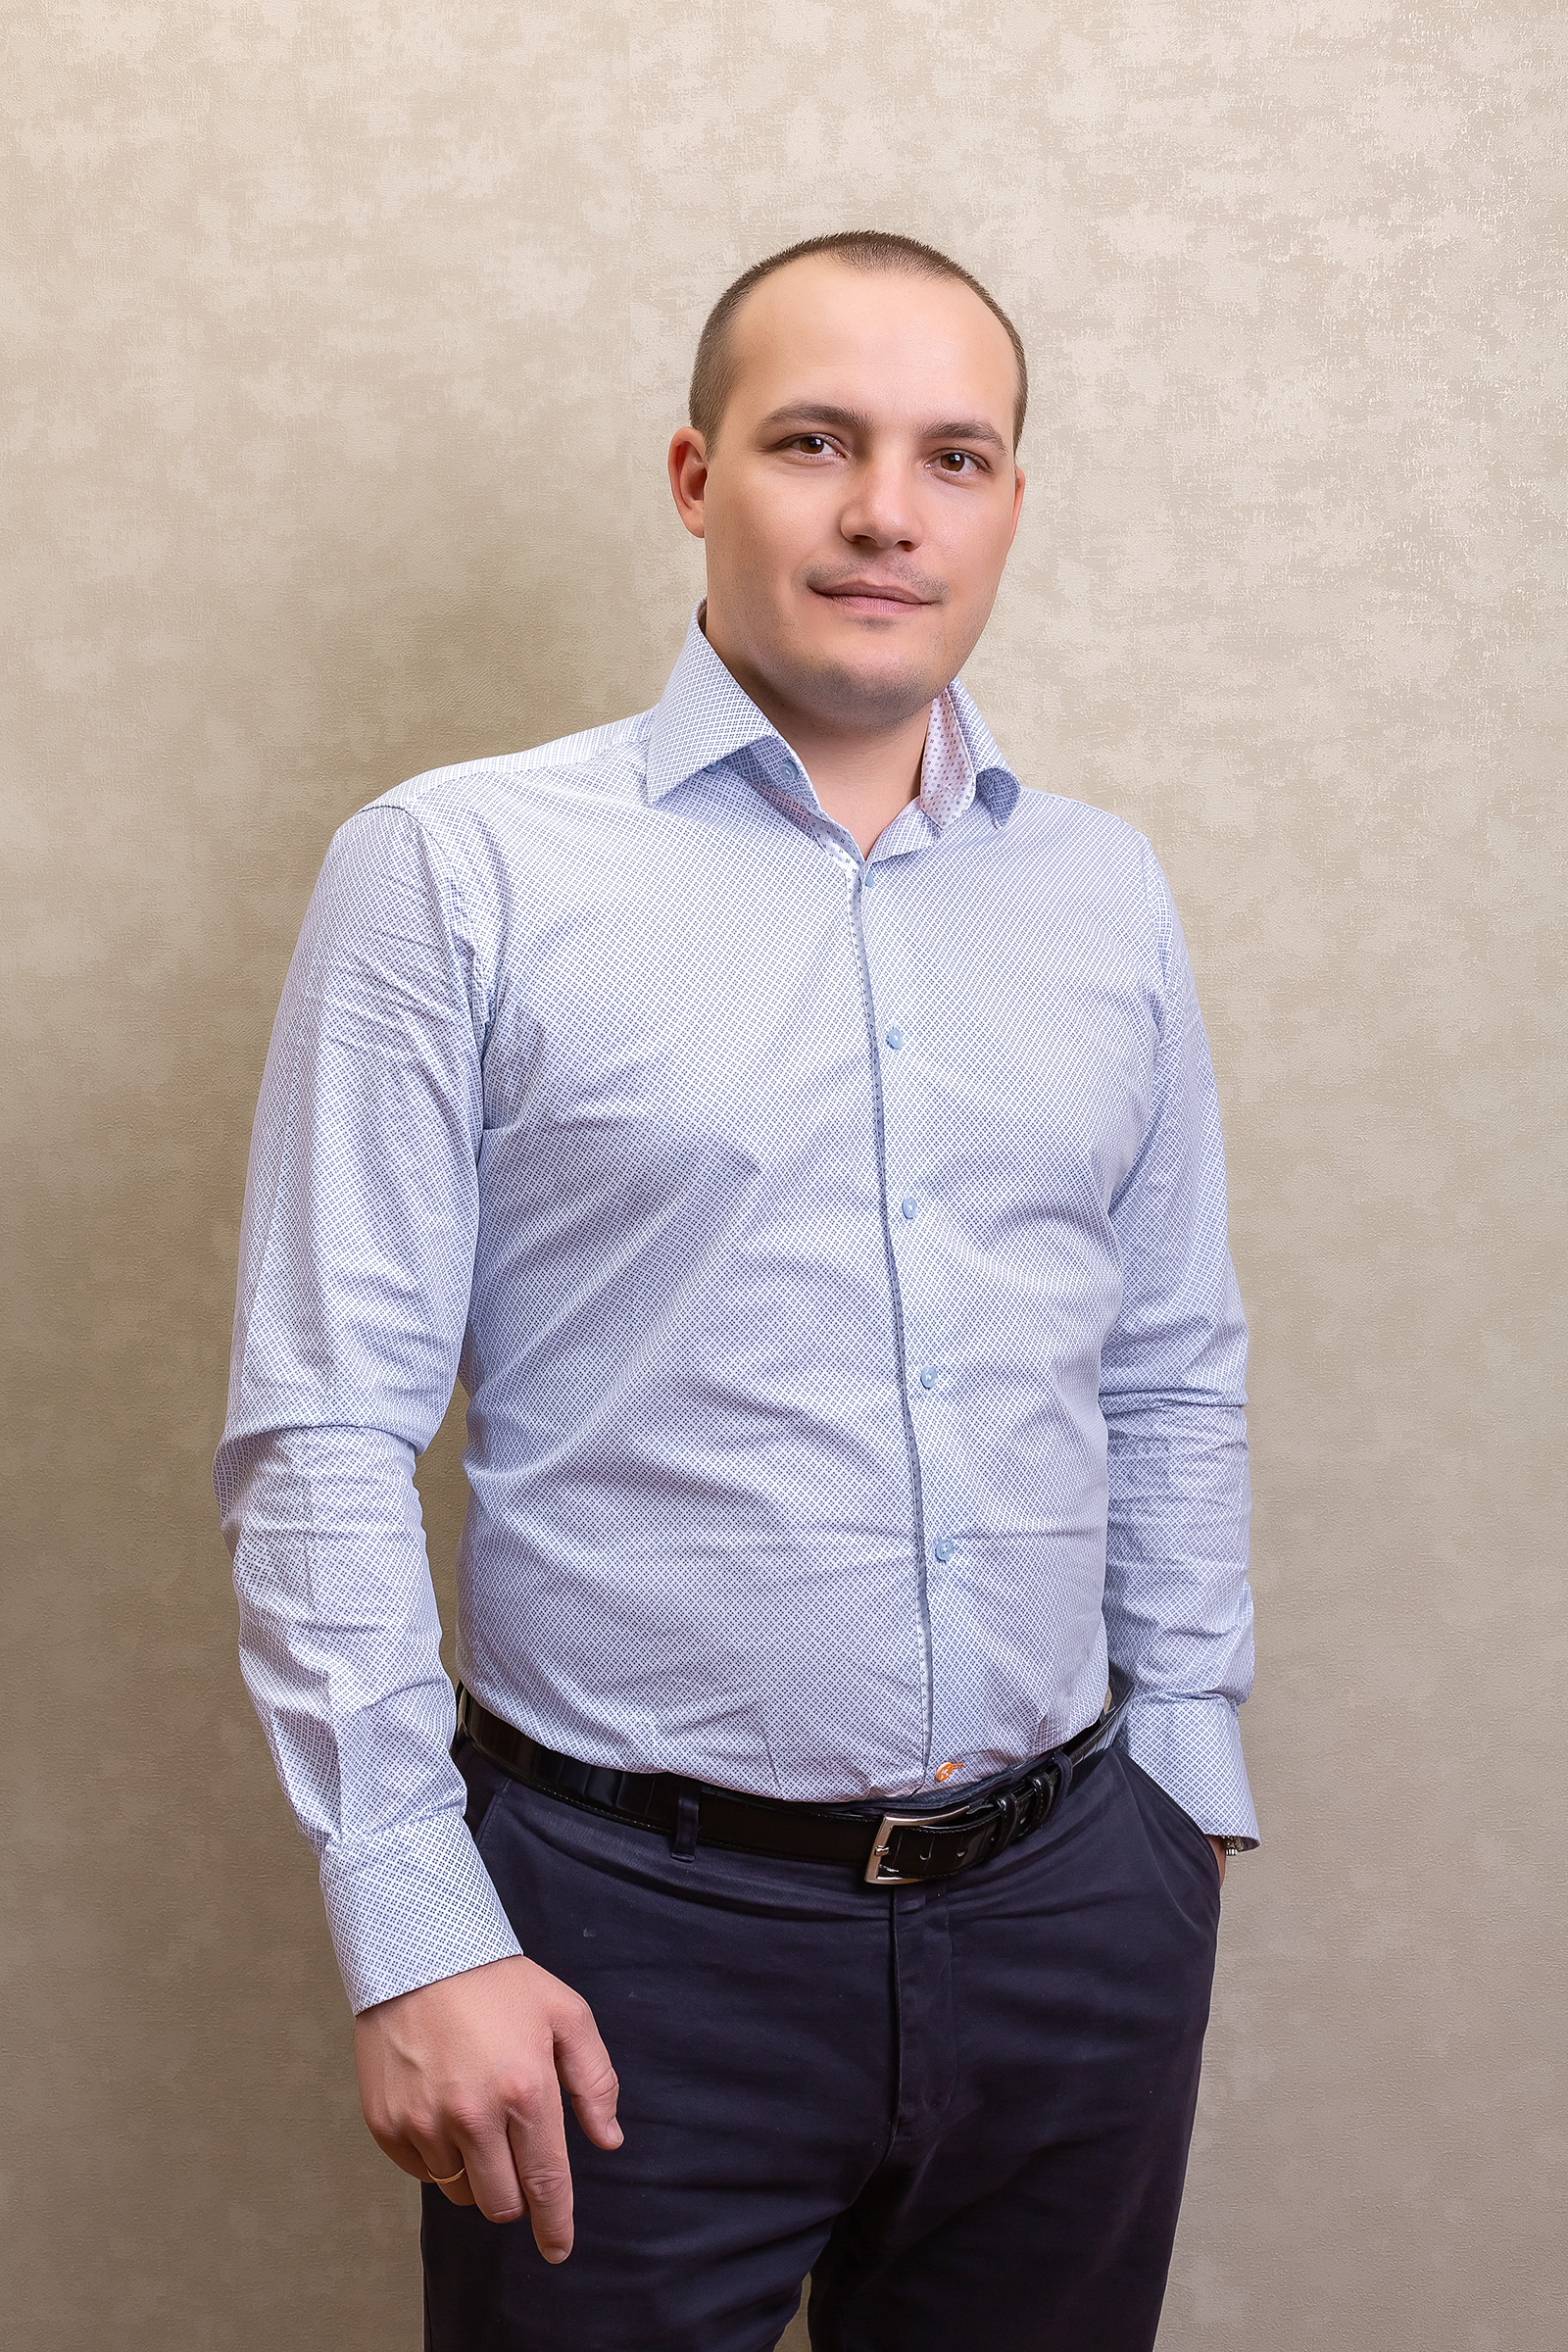 Шаламов Константин Николаевич